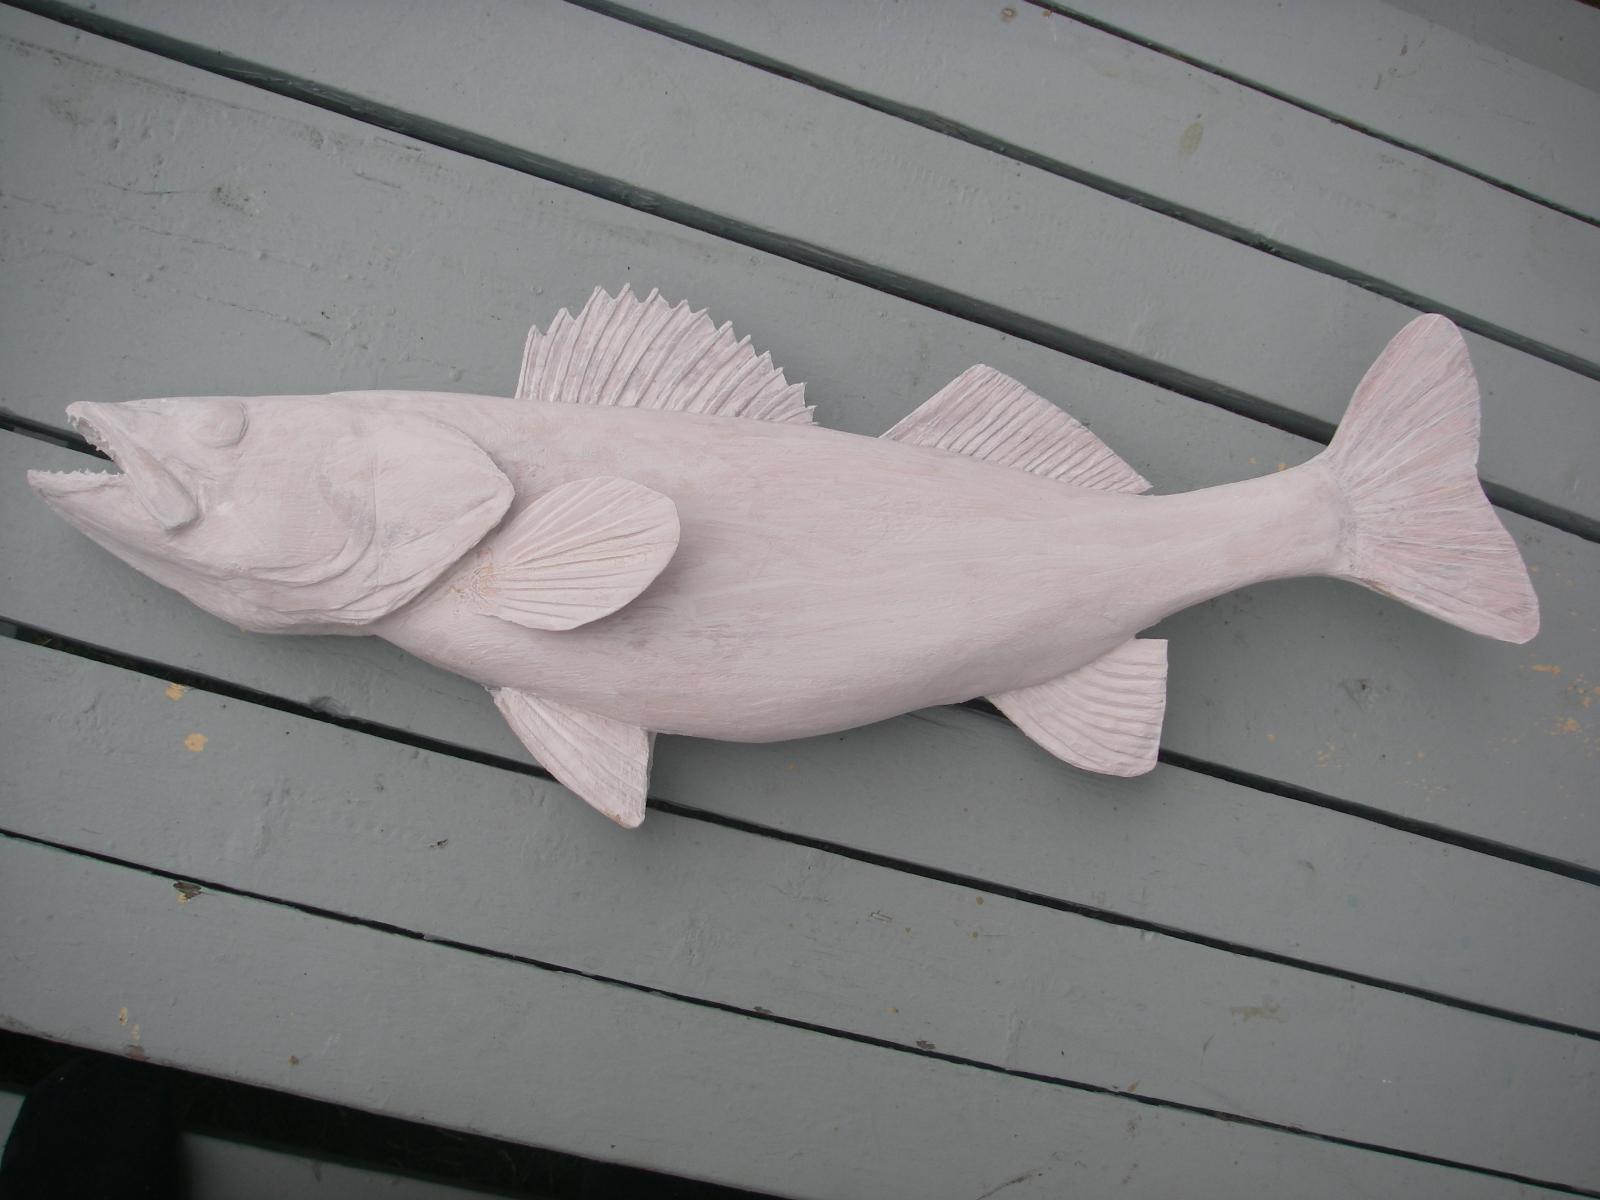 Charles weiss art big wood walleye